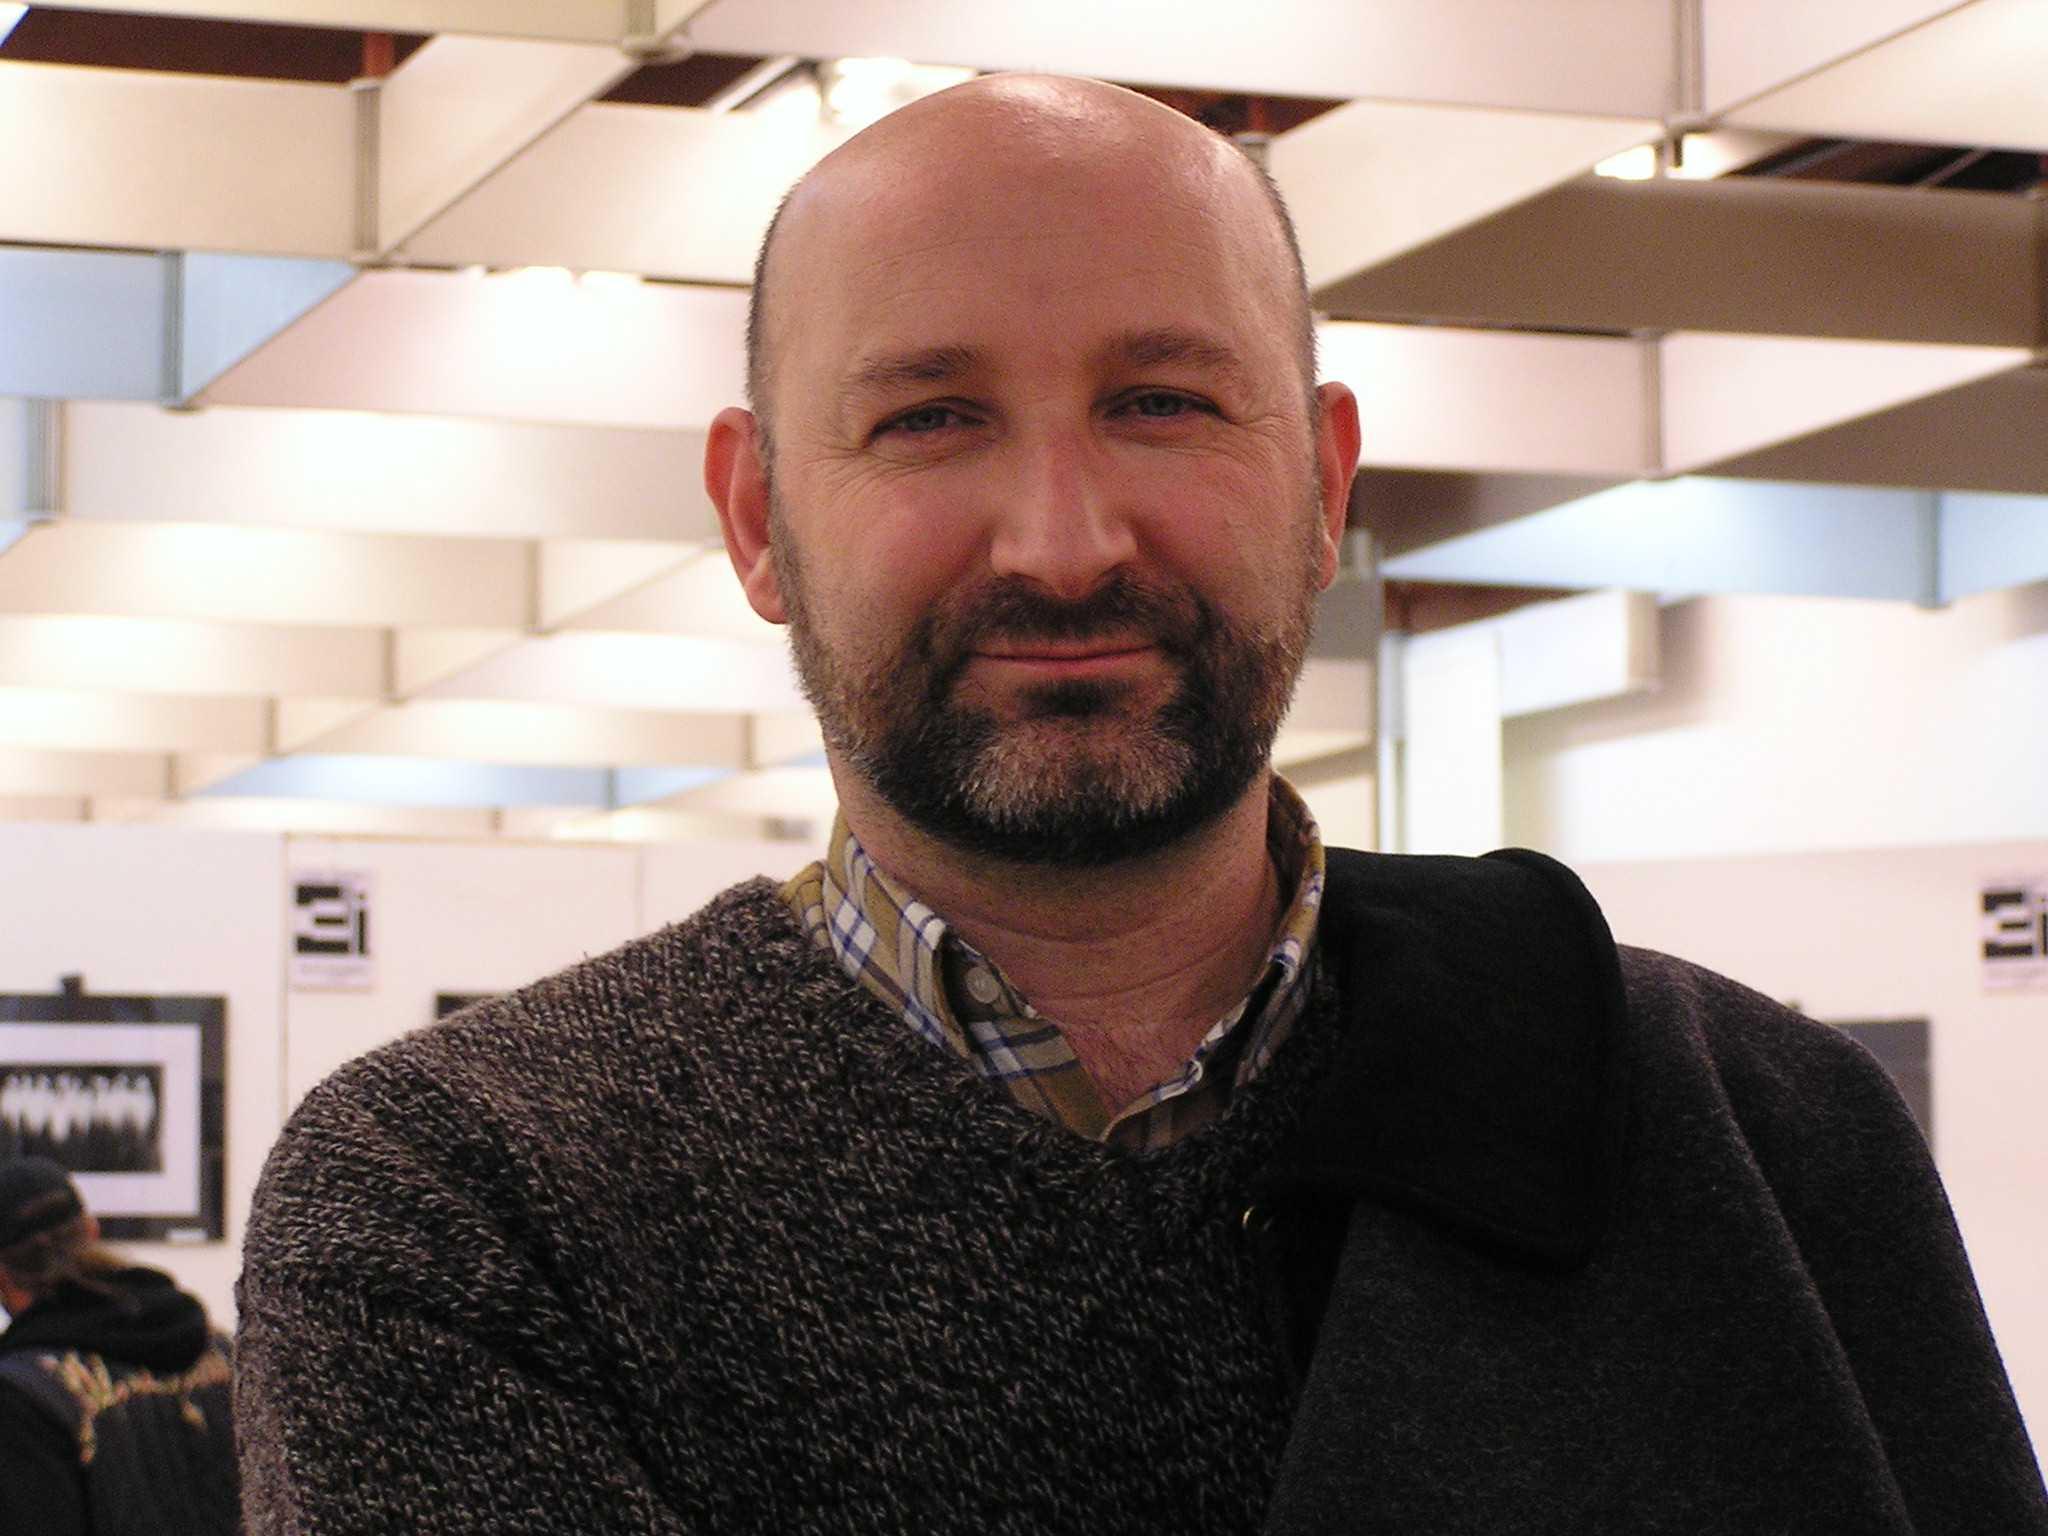 Fausto Oggionni